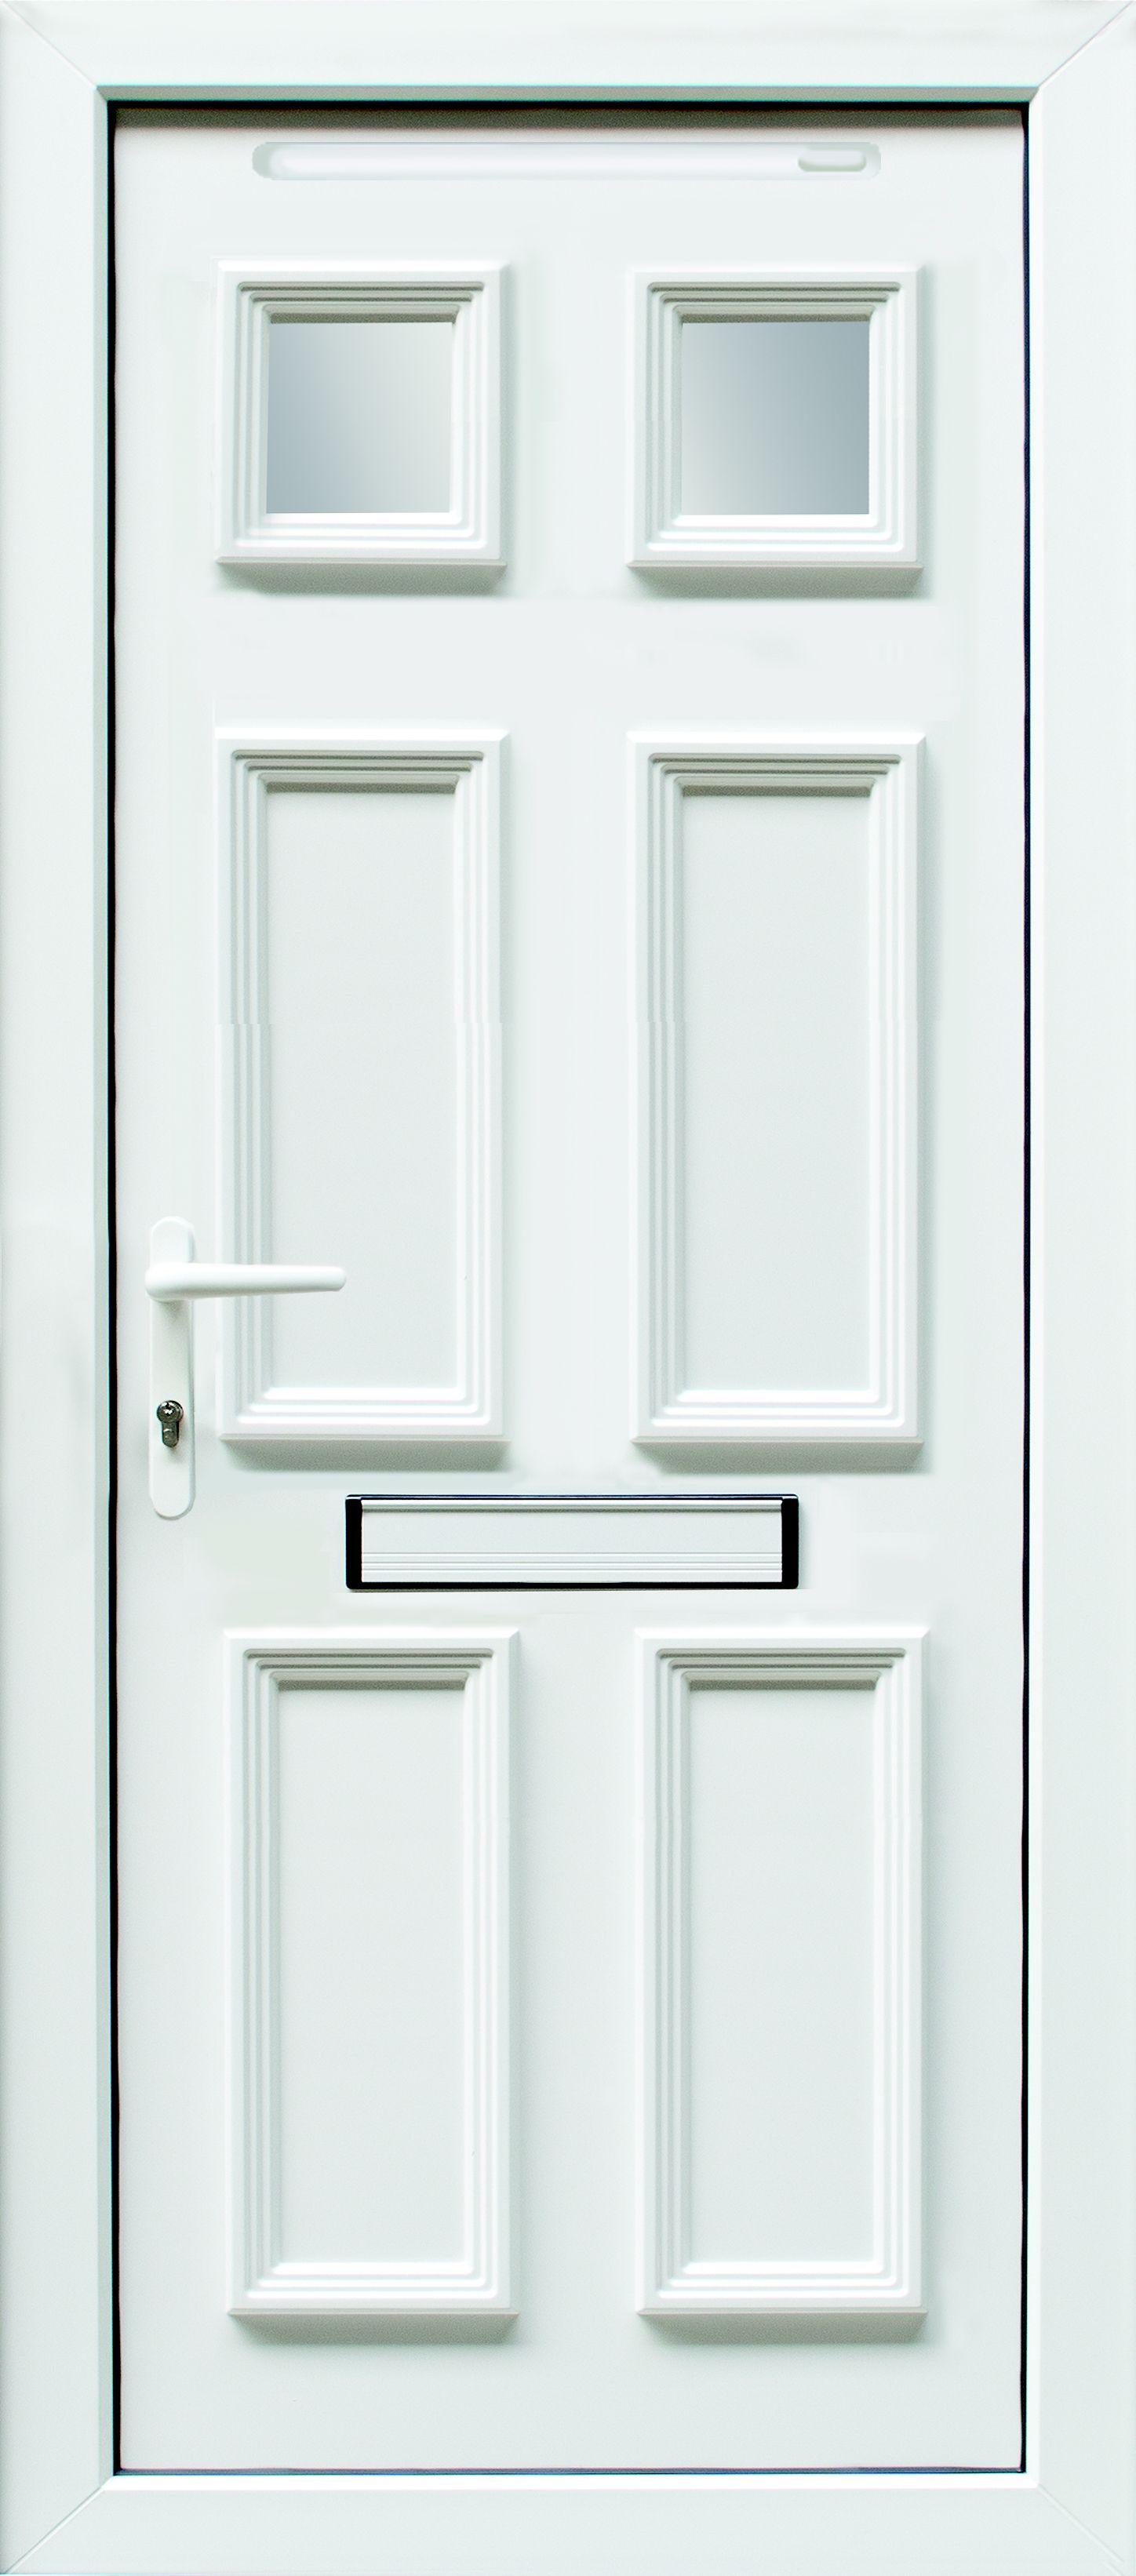 6 Panel Pvcu Glazed External Front Door U0026 Frame Rh, (h)2055mm (